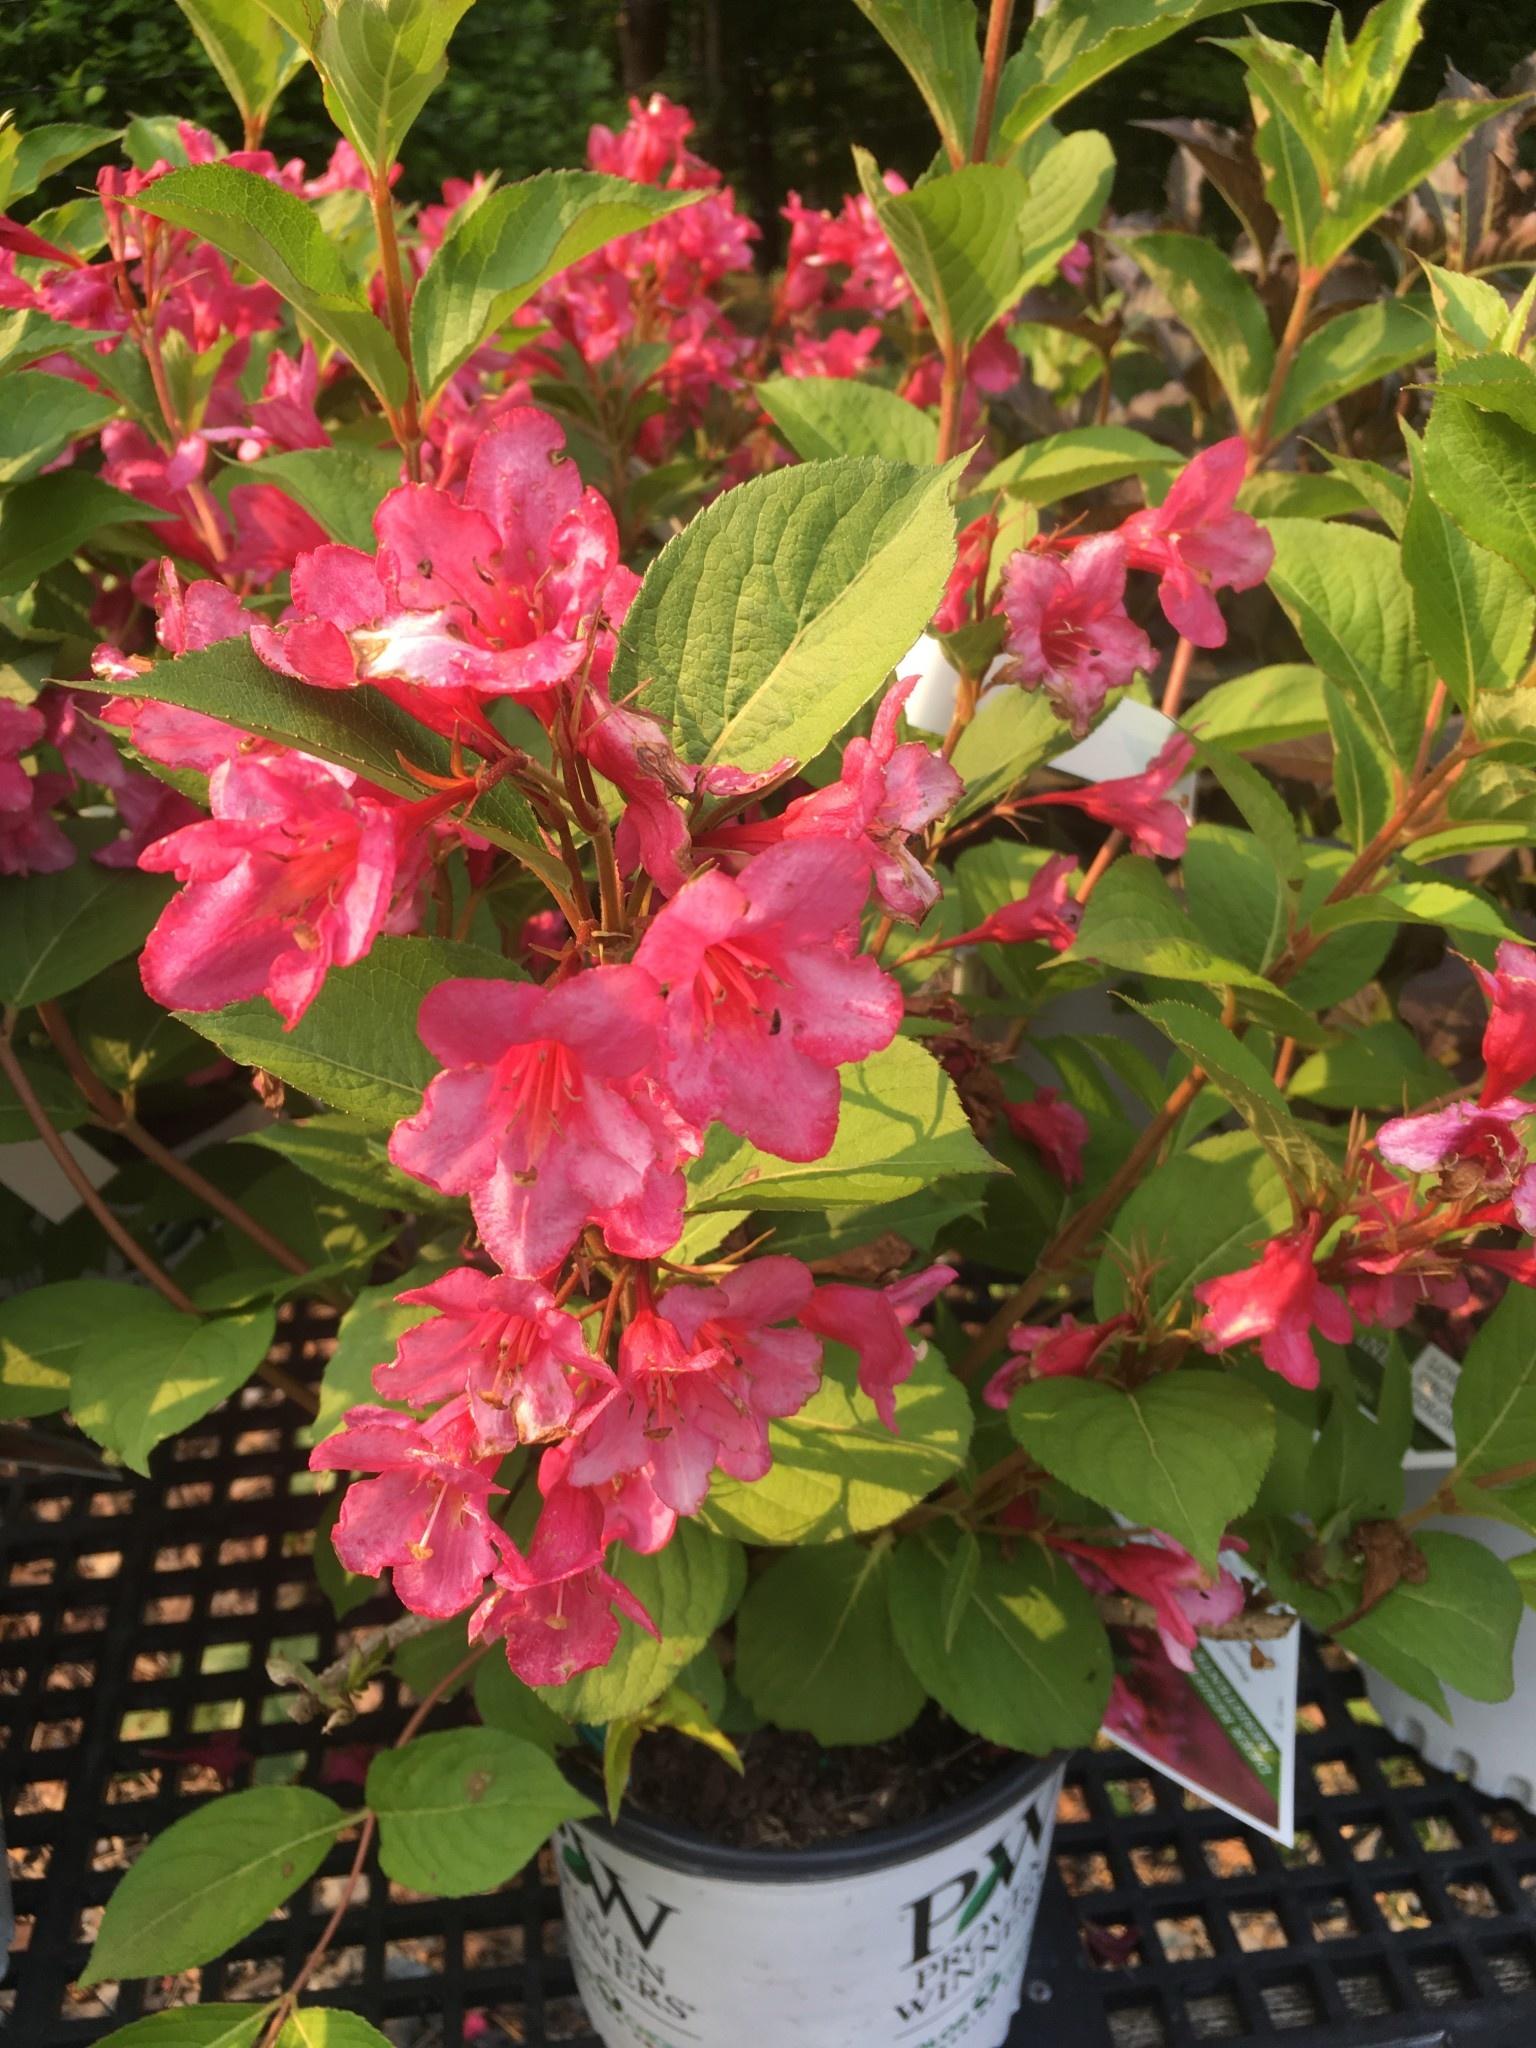 Weigela florida Bokrasopin Weigela, Sonic Bloom Pink, #3